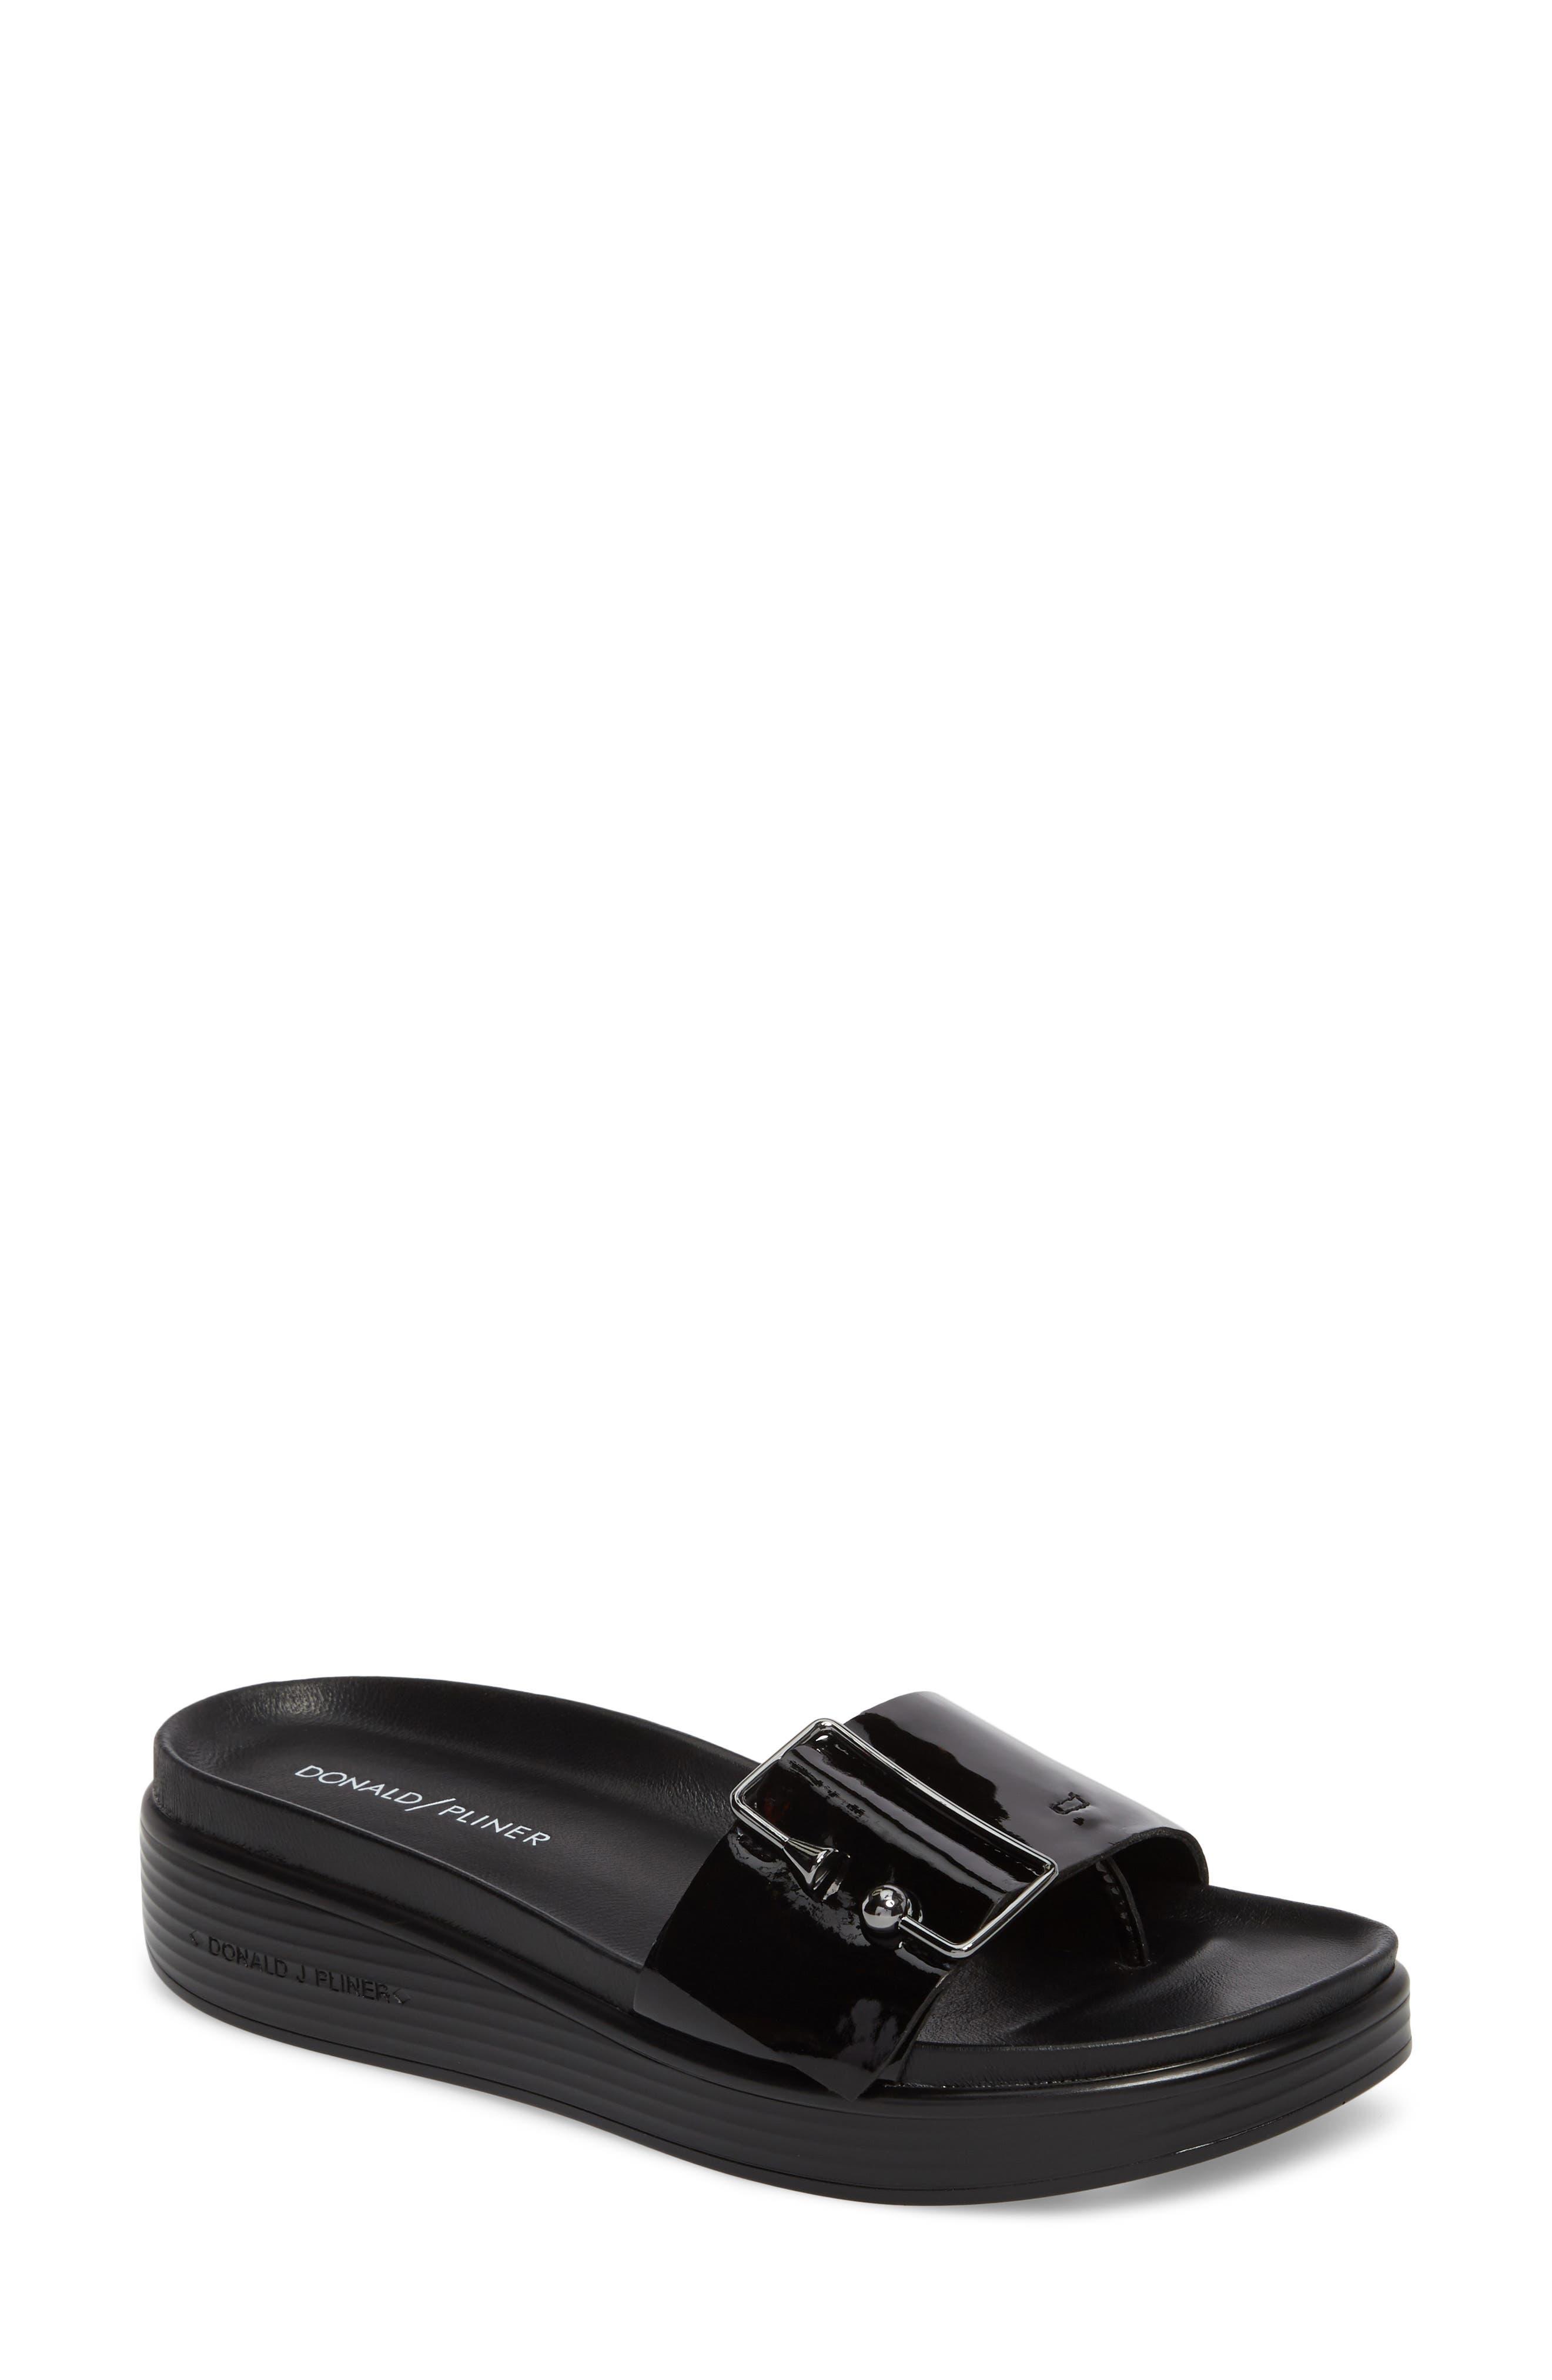 Fara Platform Slide Sandal,                             Main thumbnail 1, color,                             001